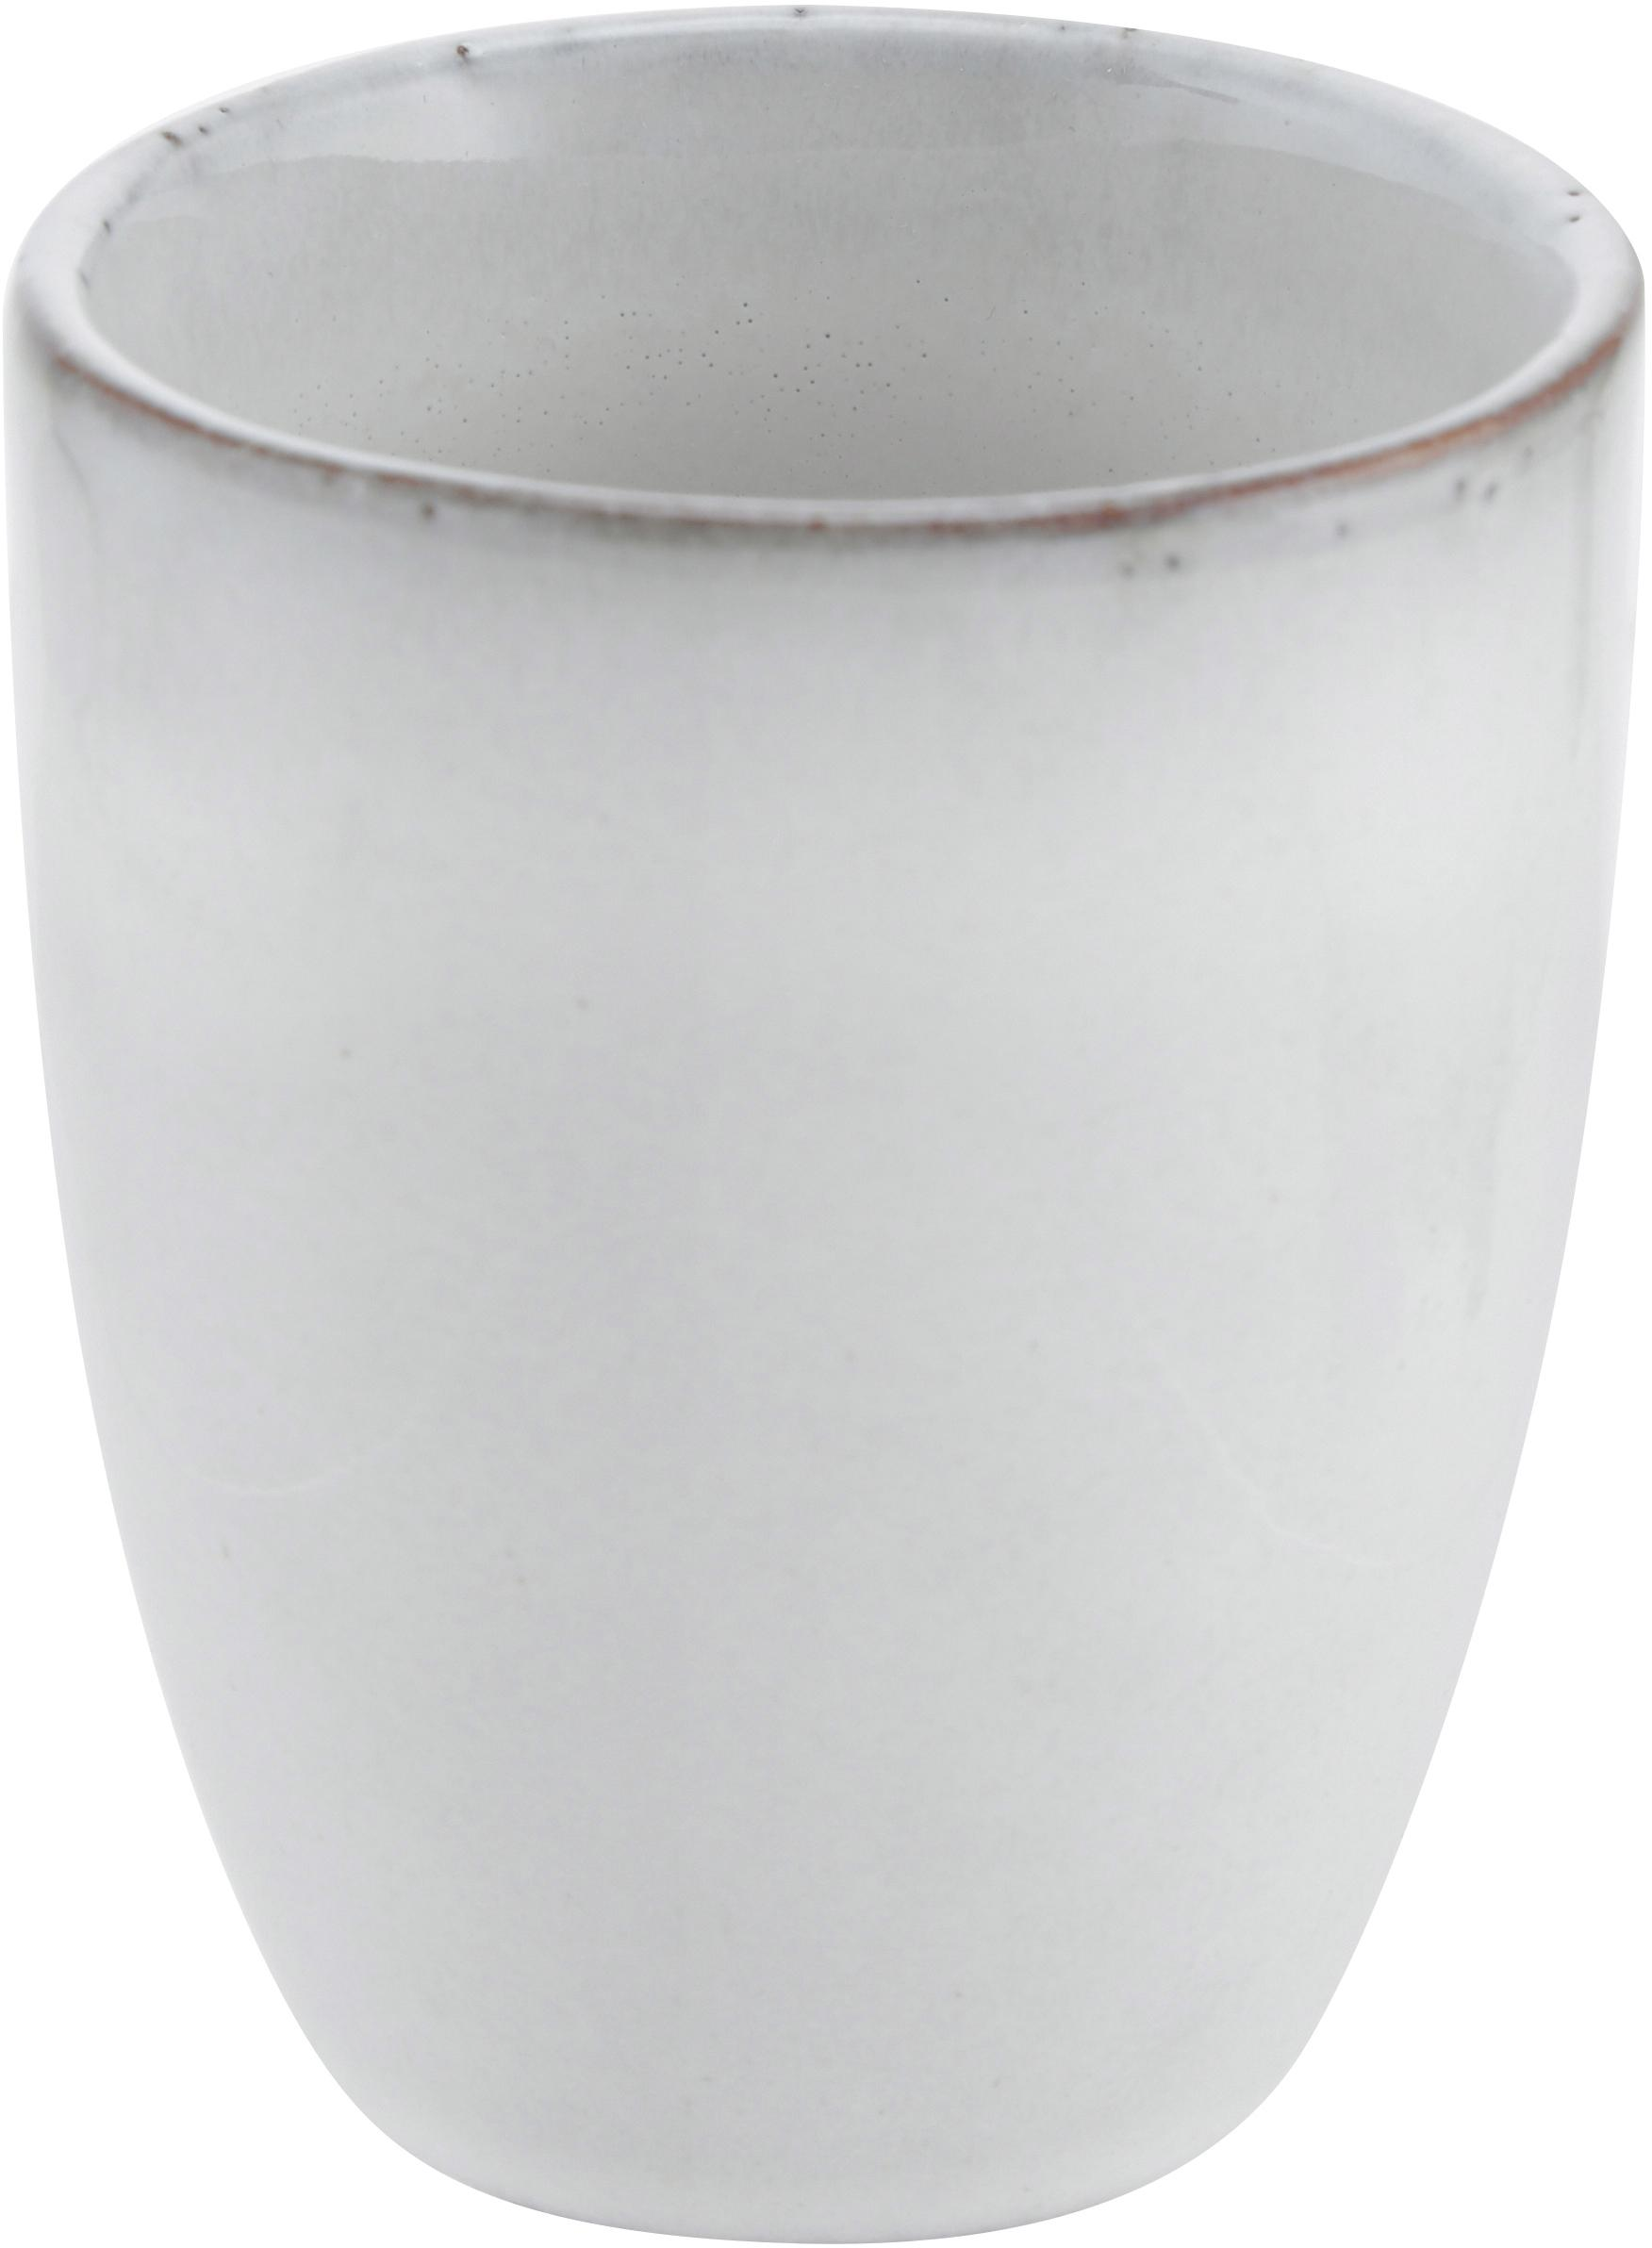 Handgemaakte espressobekers Nordic Sand, 6 stuks, Keramiek, Zandkleurig, Ø 7 x H 8 cm